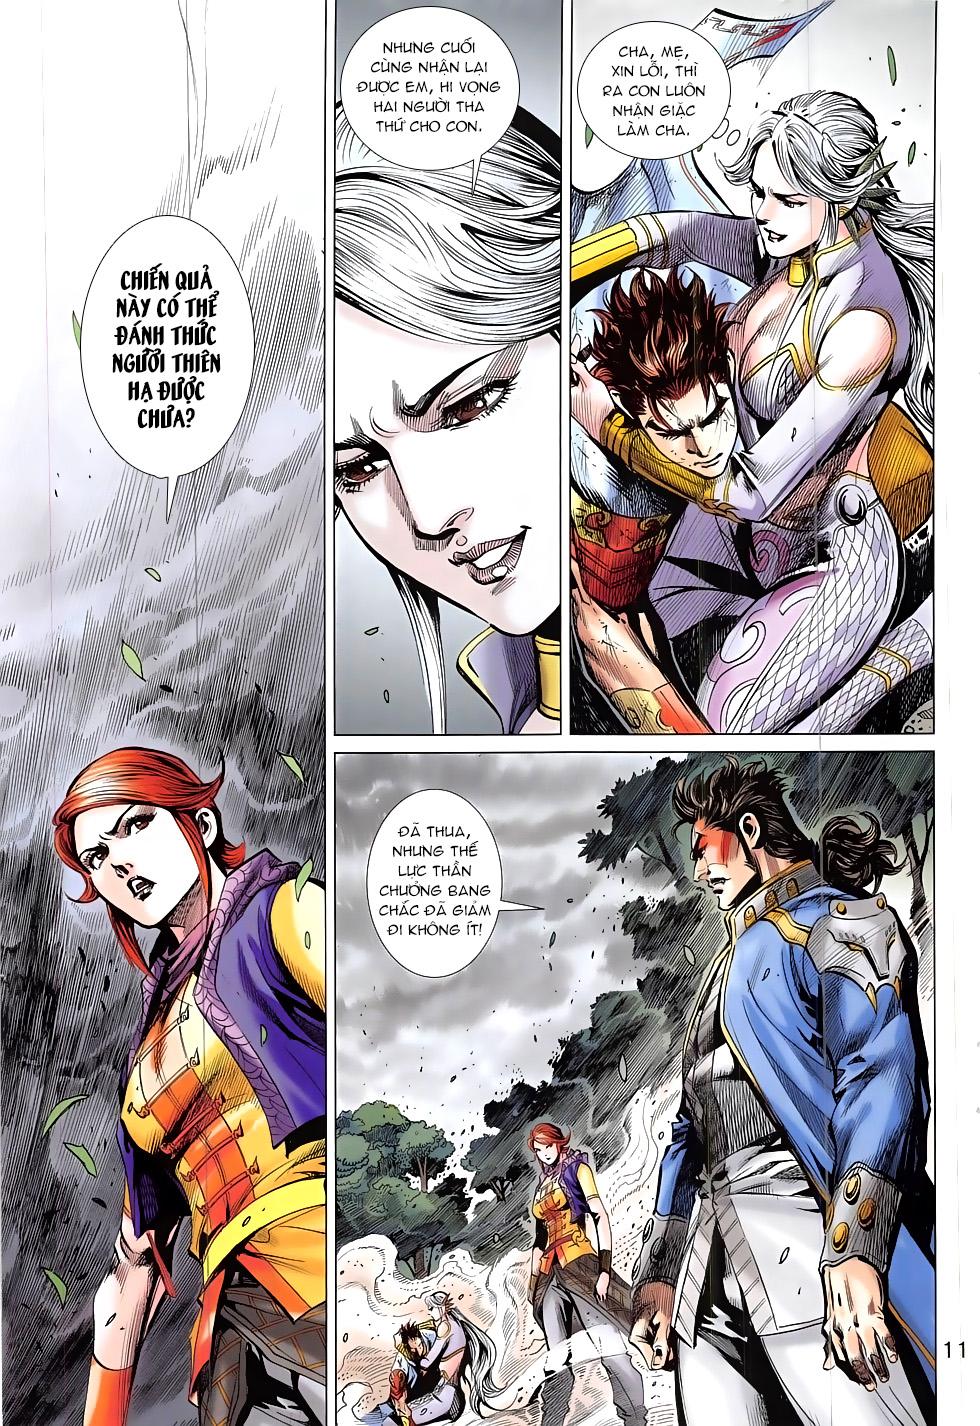 Thần Chưởng chap 24 – End Trang 11 - Mangak.info